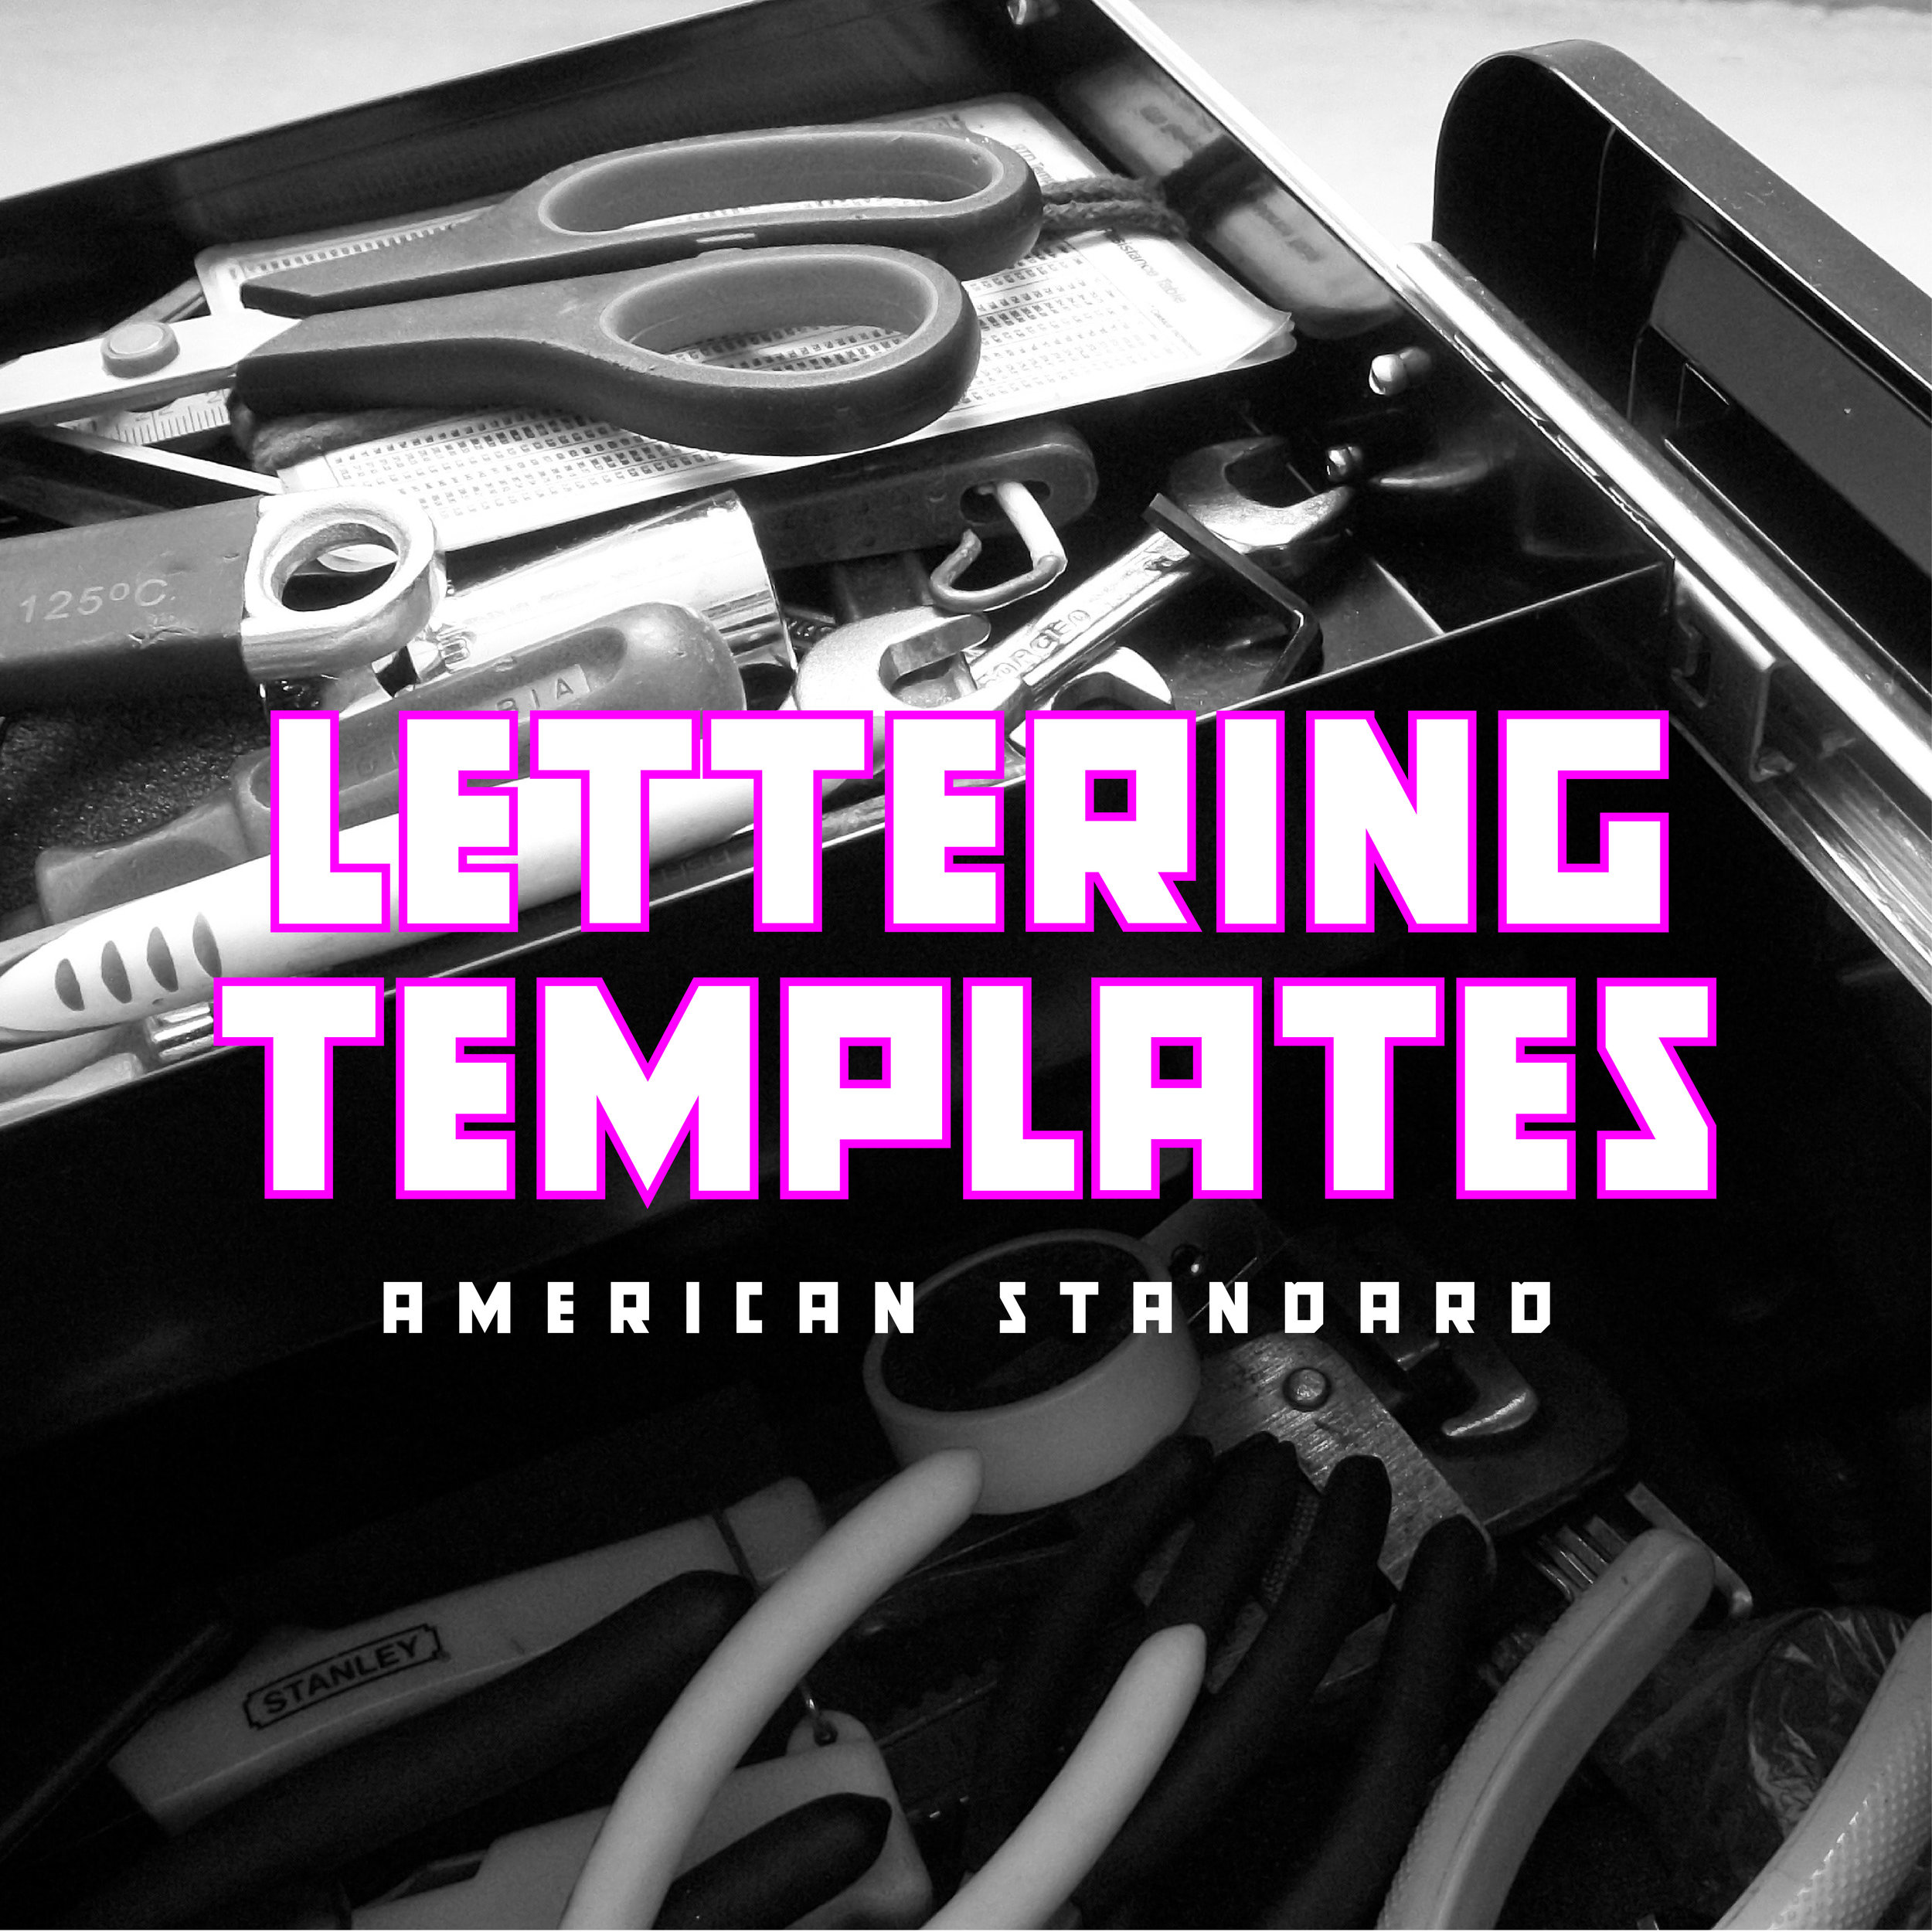 LF_LetteringTemplates.jpg